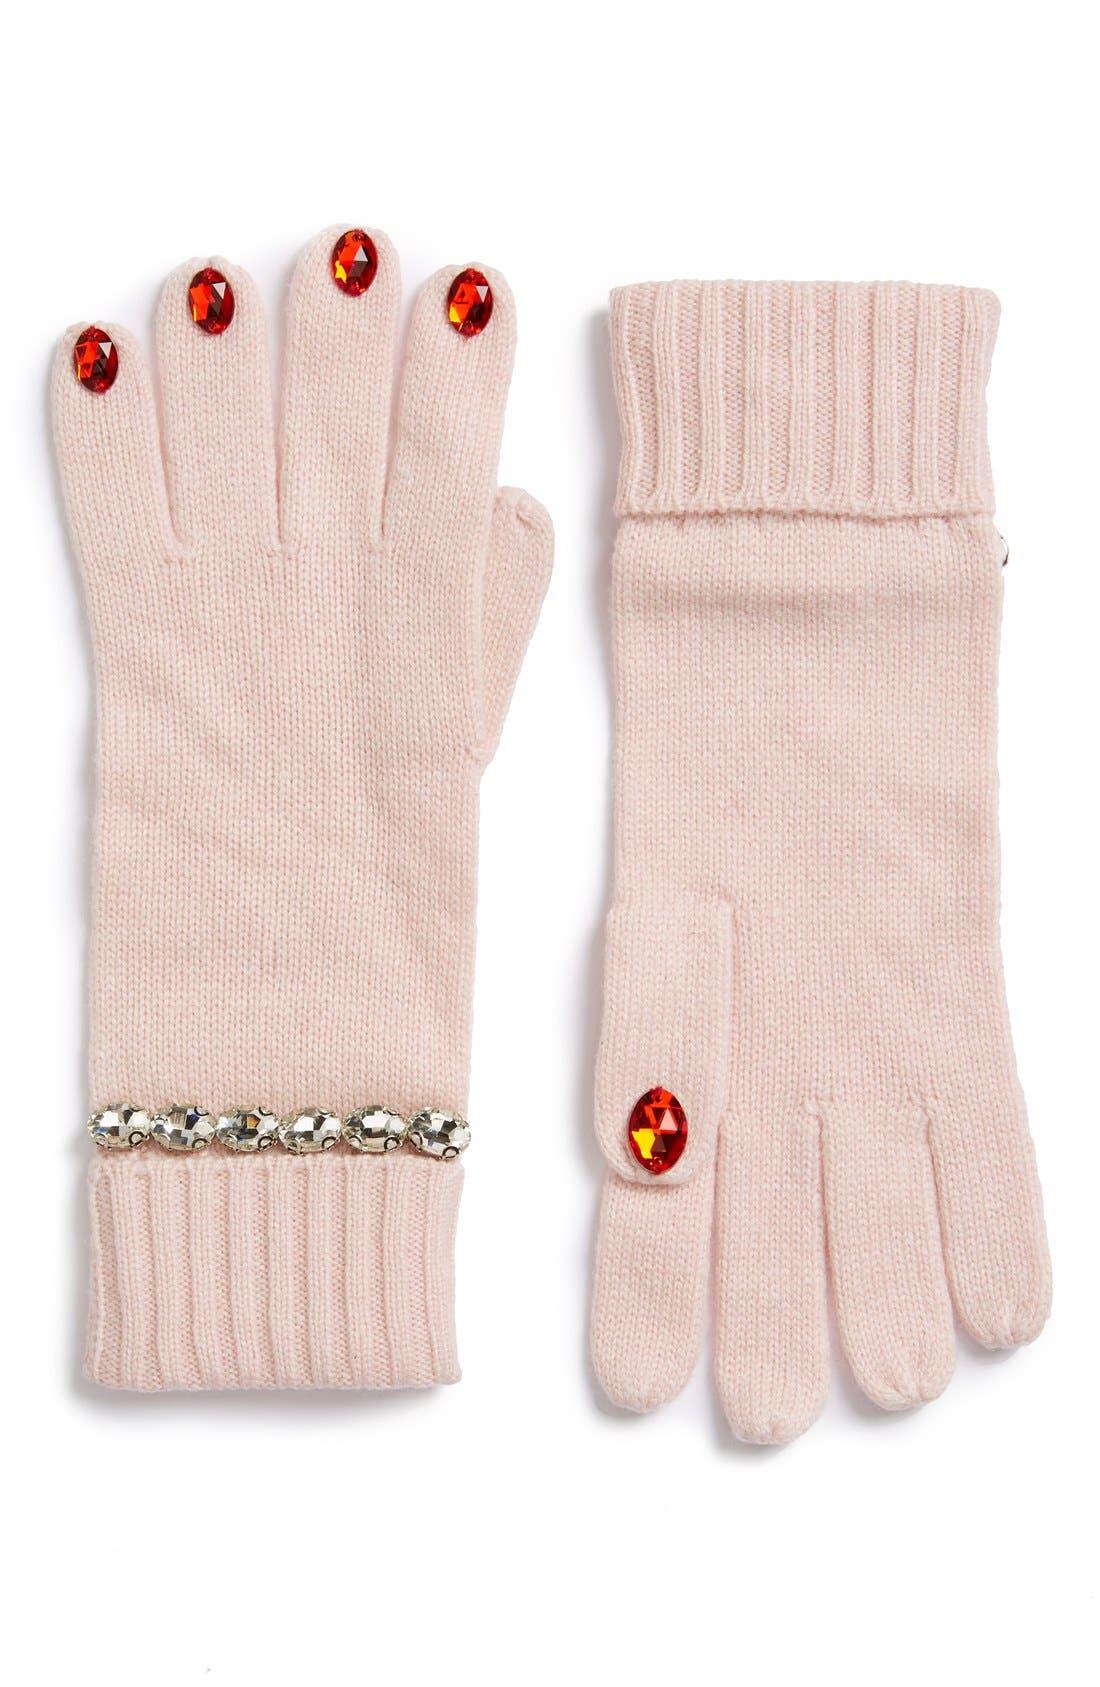 KATE SPADE NEW YORK,                             'pretty lady' gloves,                             Main thumbnail 1, color,                             650